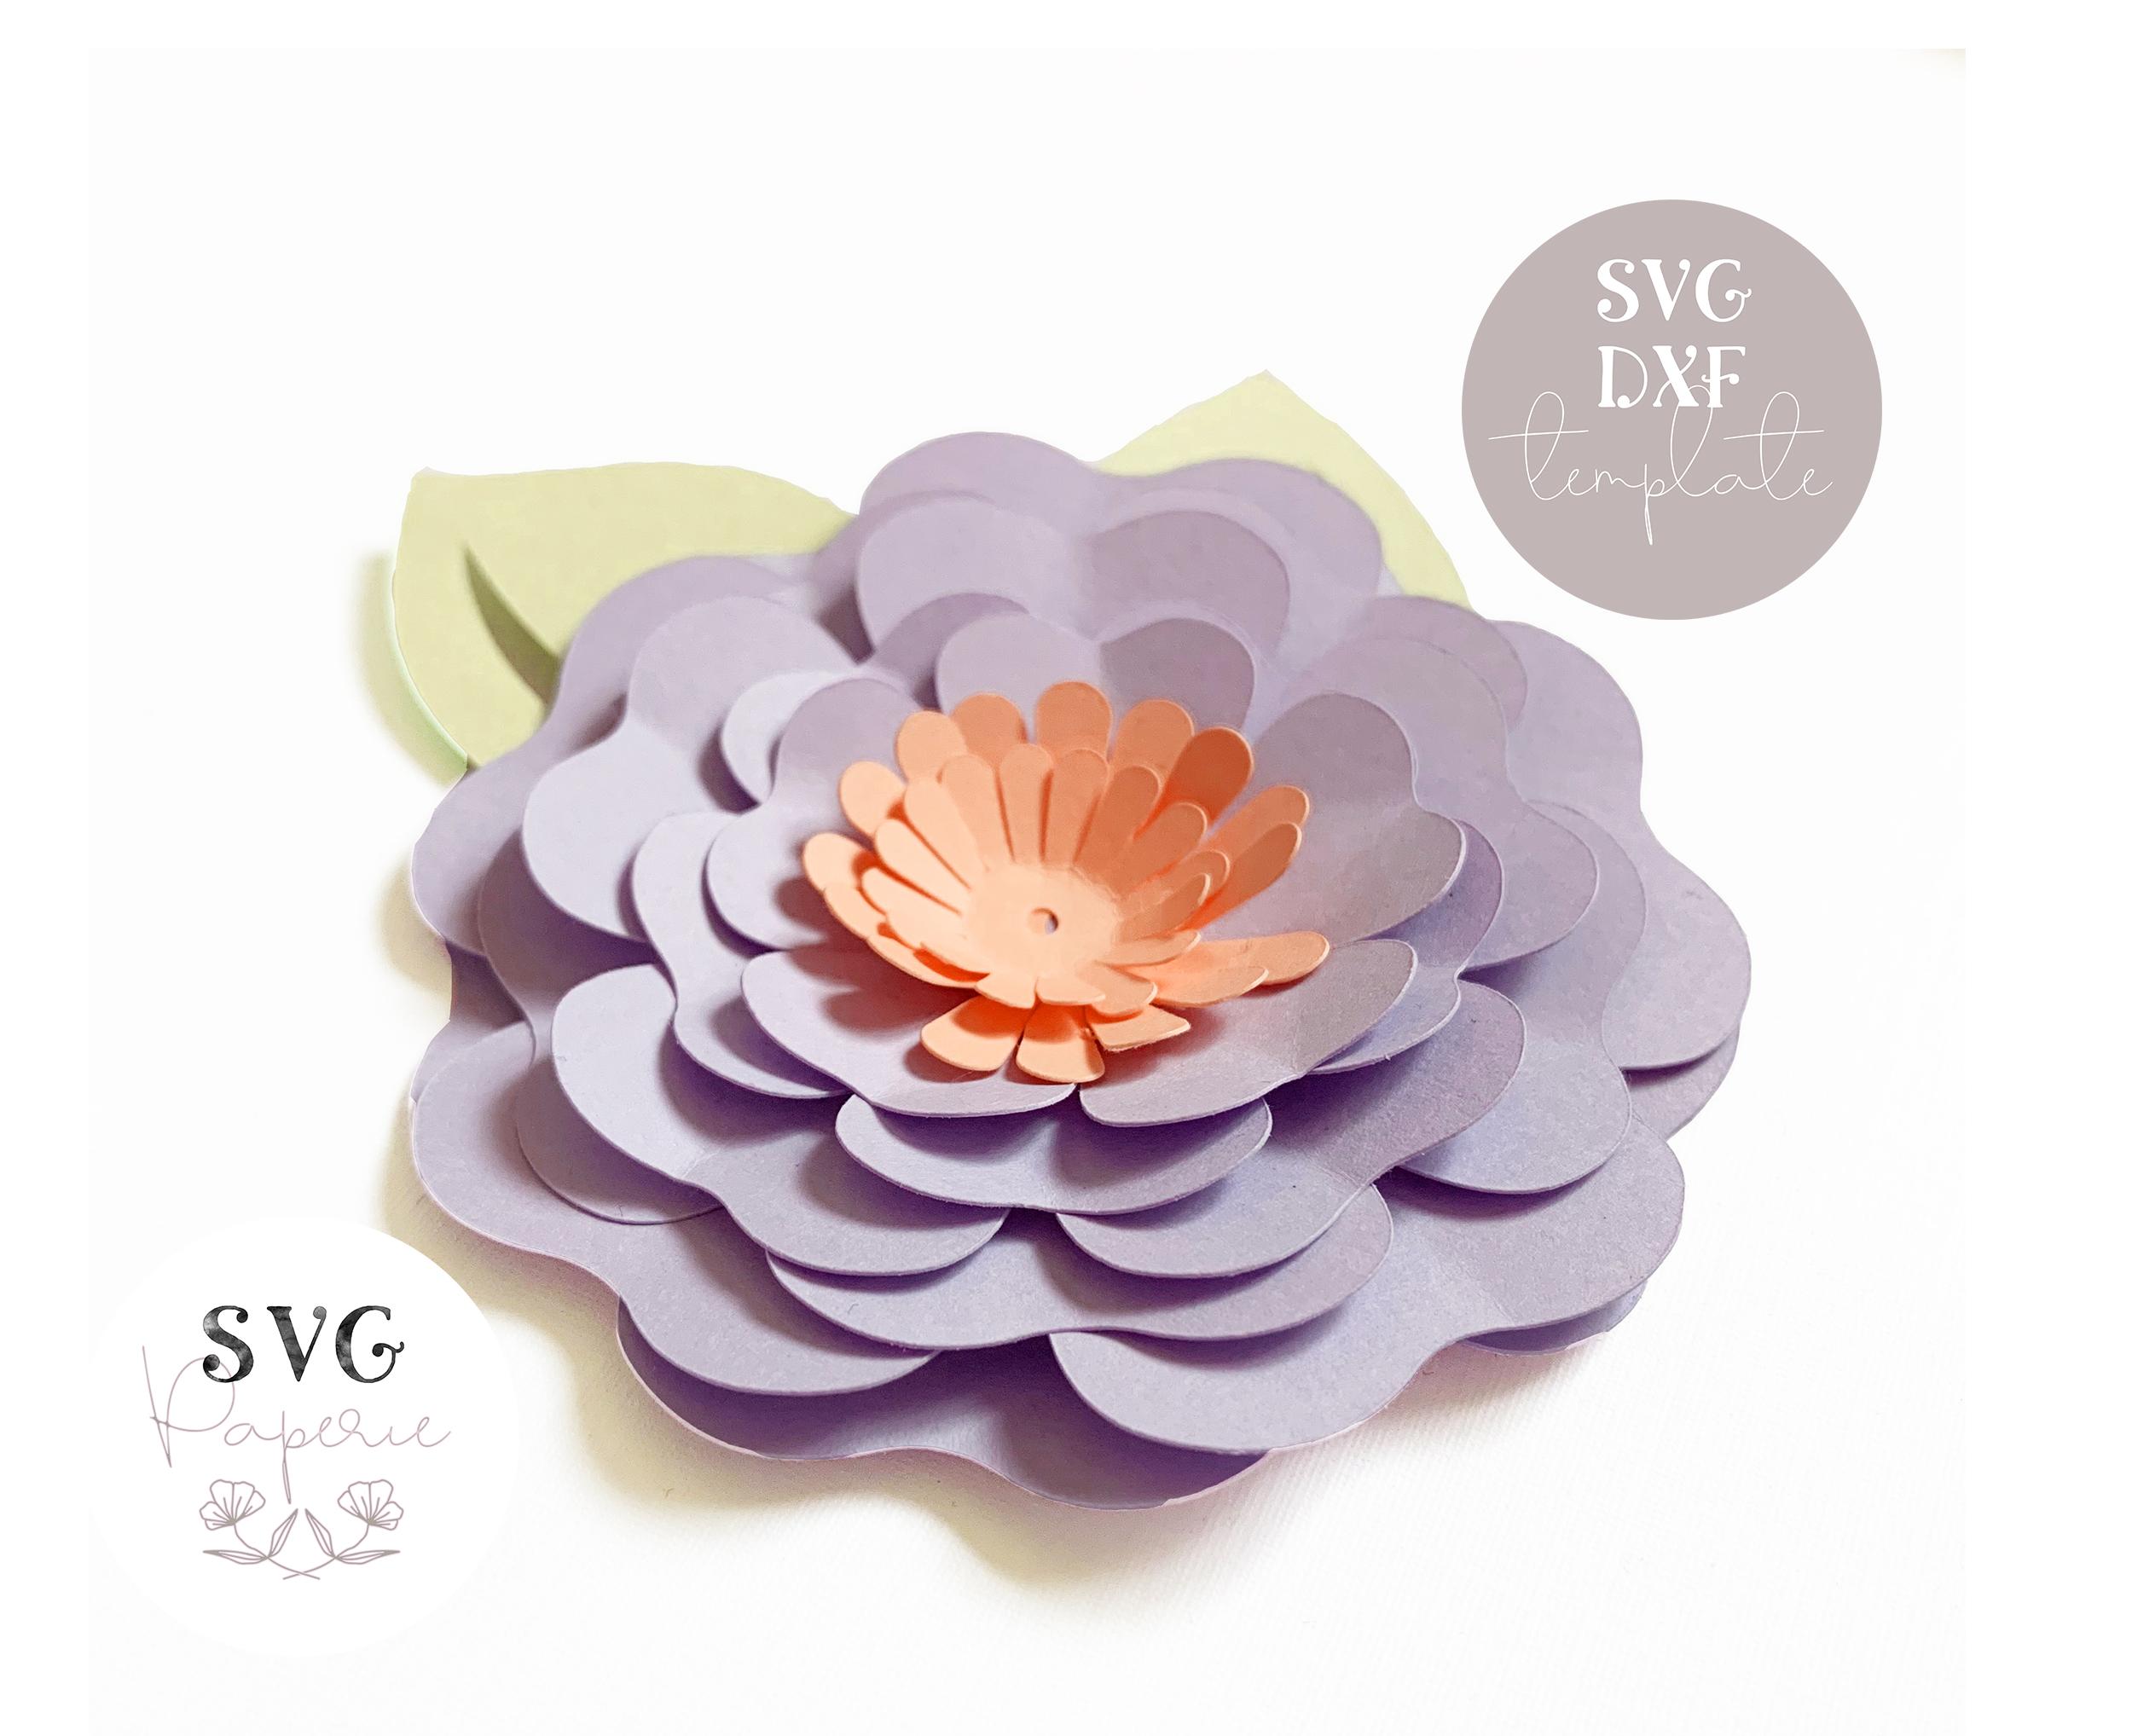 3d Flower Bundle Of 5 Svg Template Paper Flower Svg Templates Cricut And Dxf